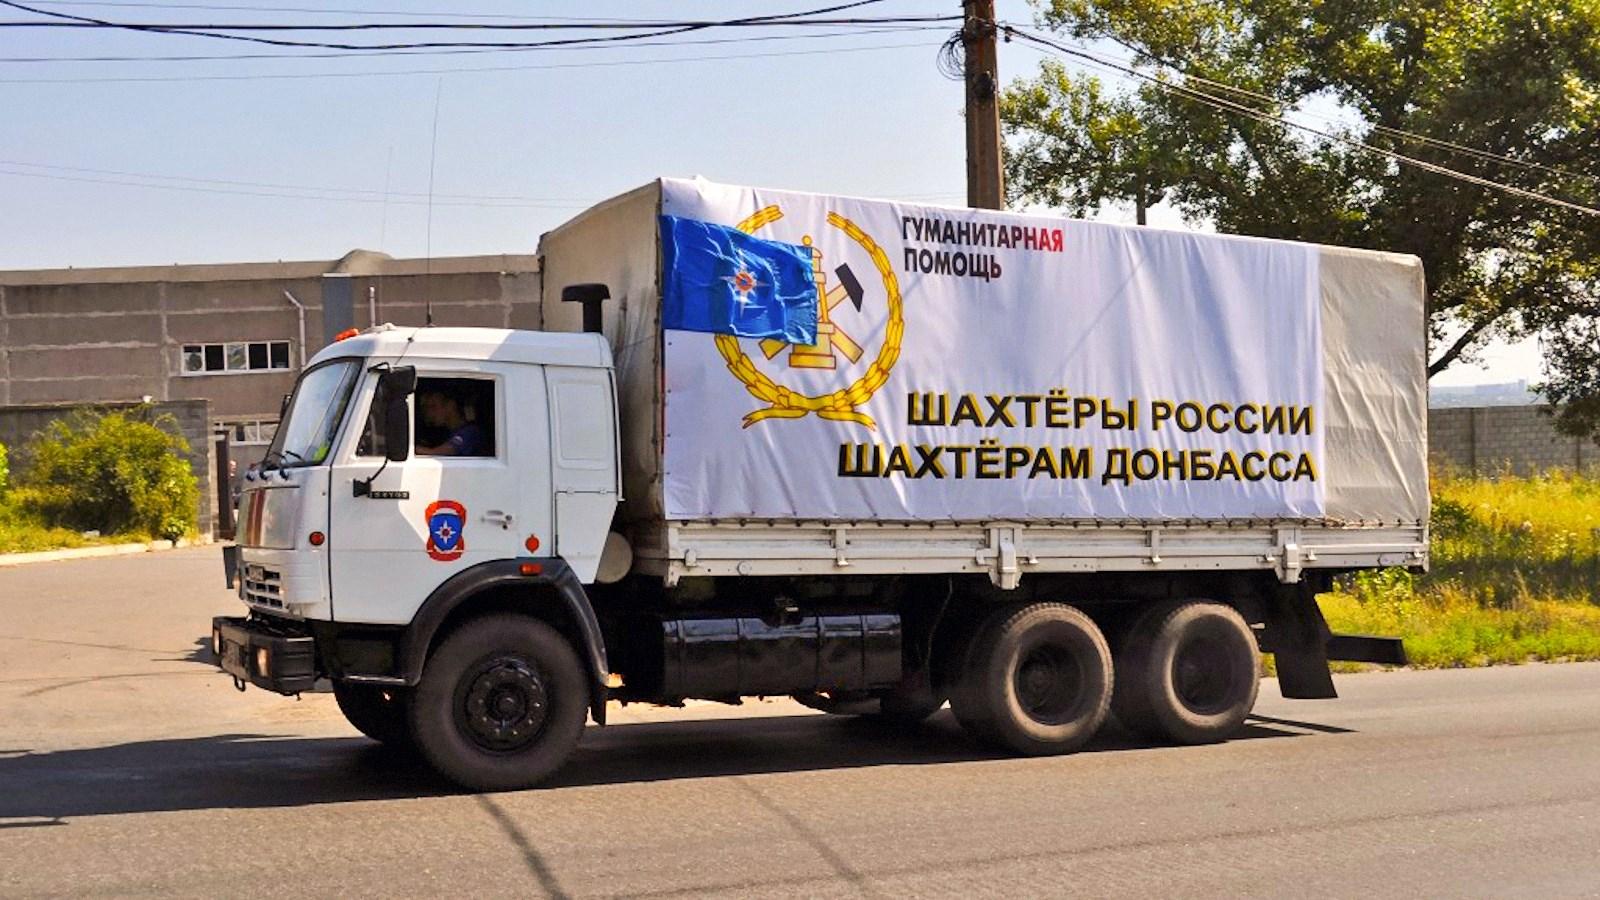 00 33rd MChS Humanitarian Convoy 02. 230715